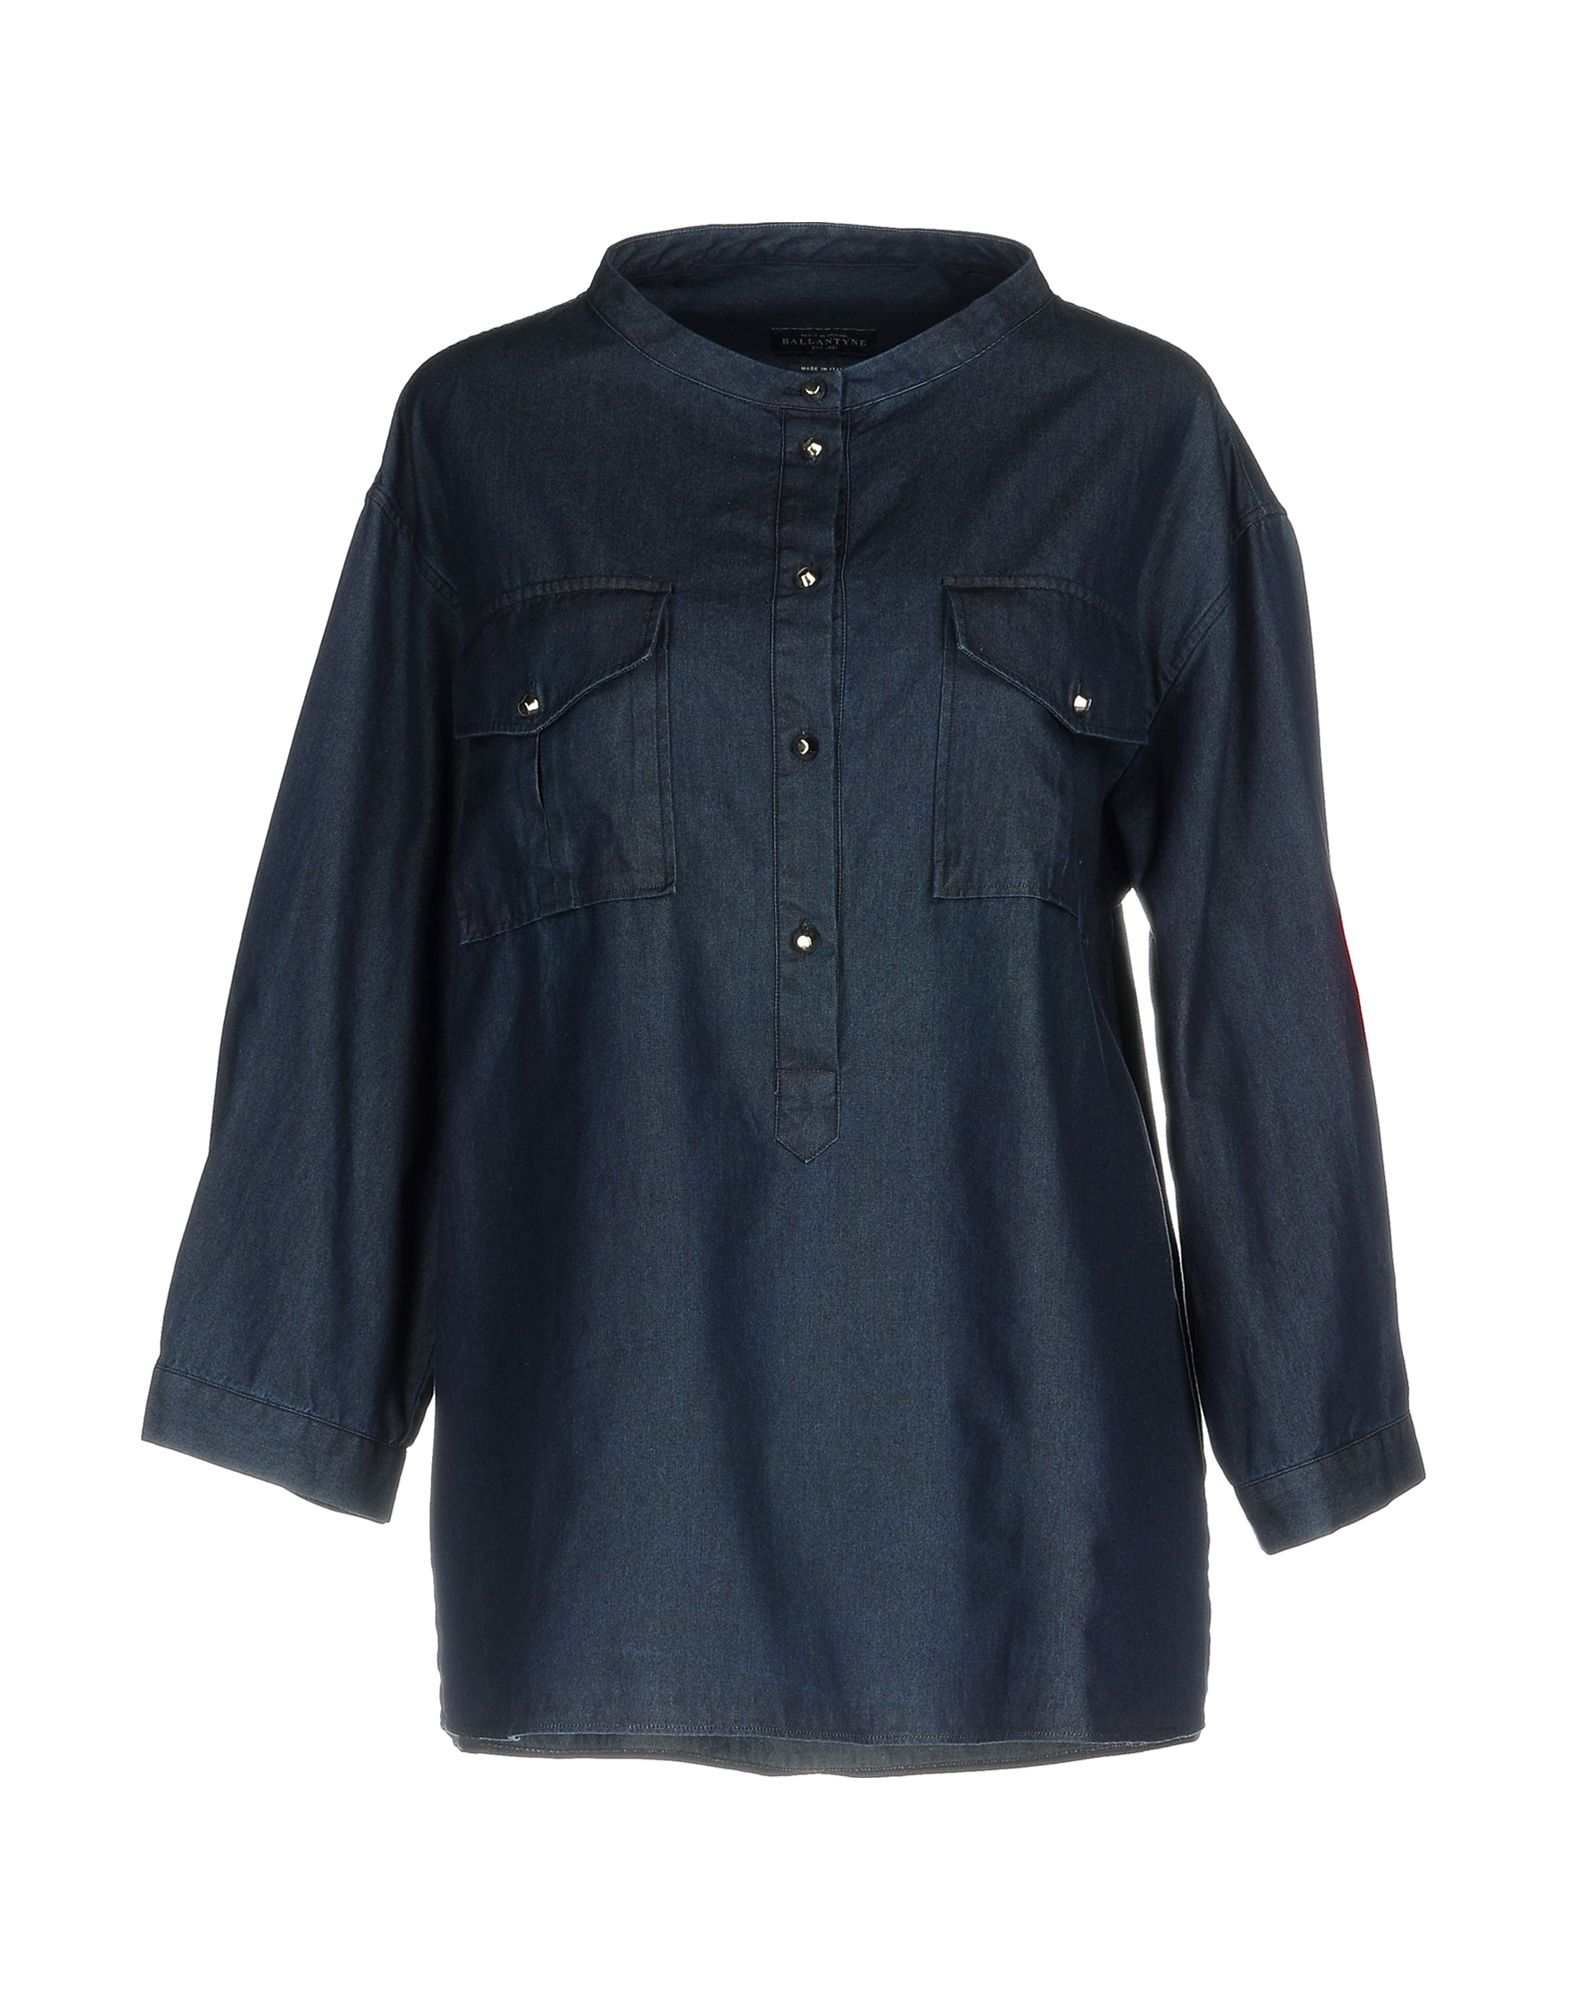 BALLANTYNE Джинсовая рубашка life sux джинсовая рубашка